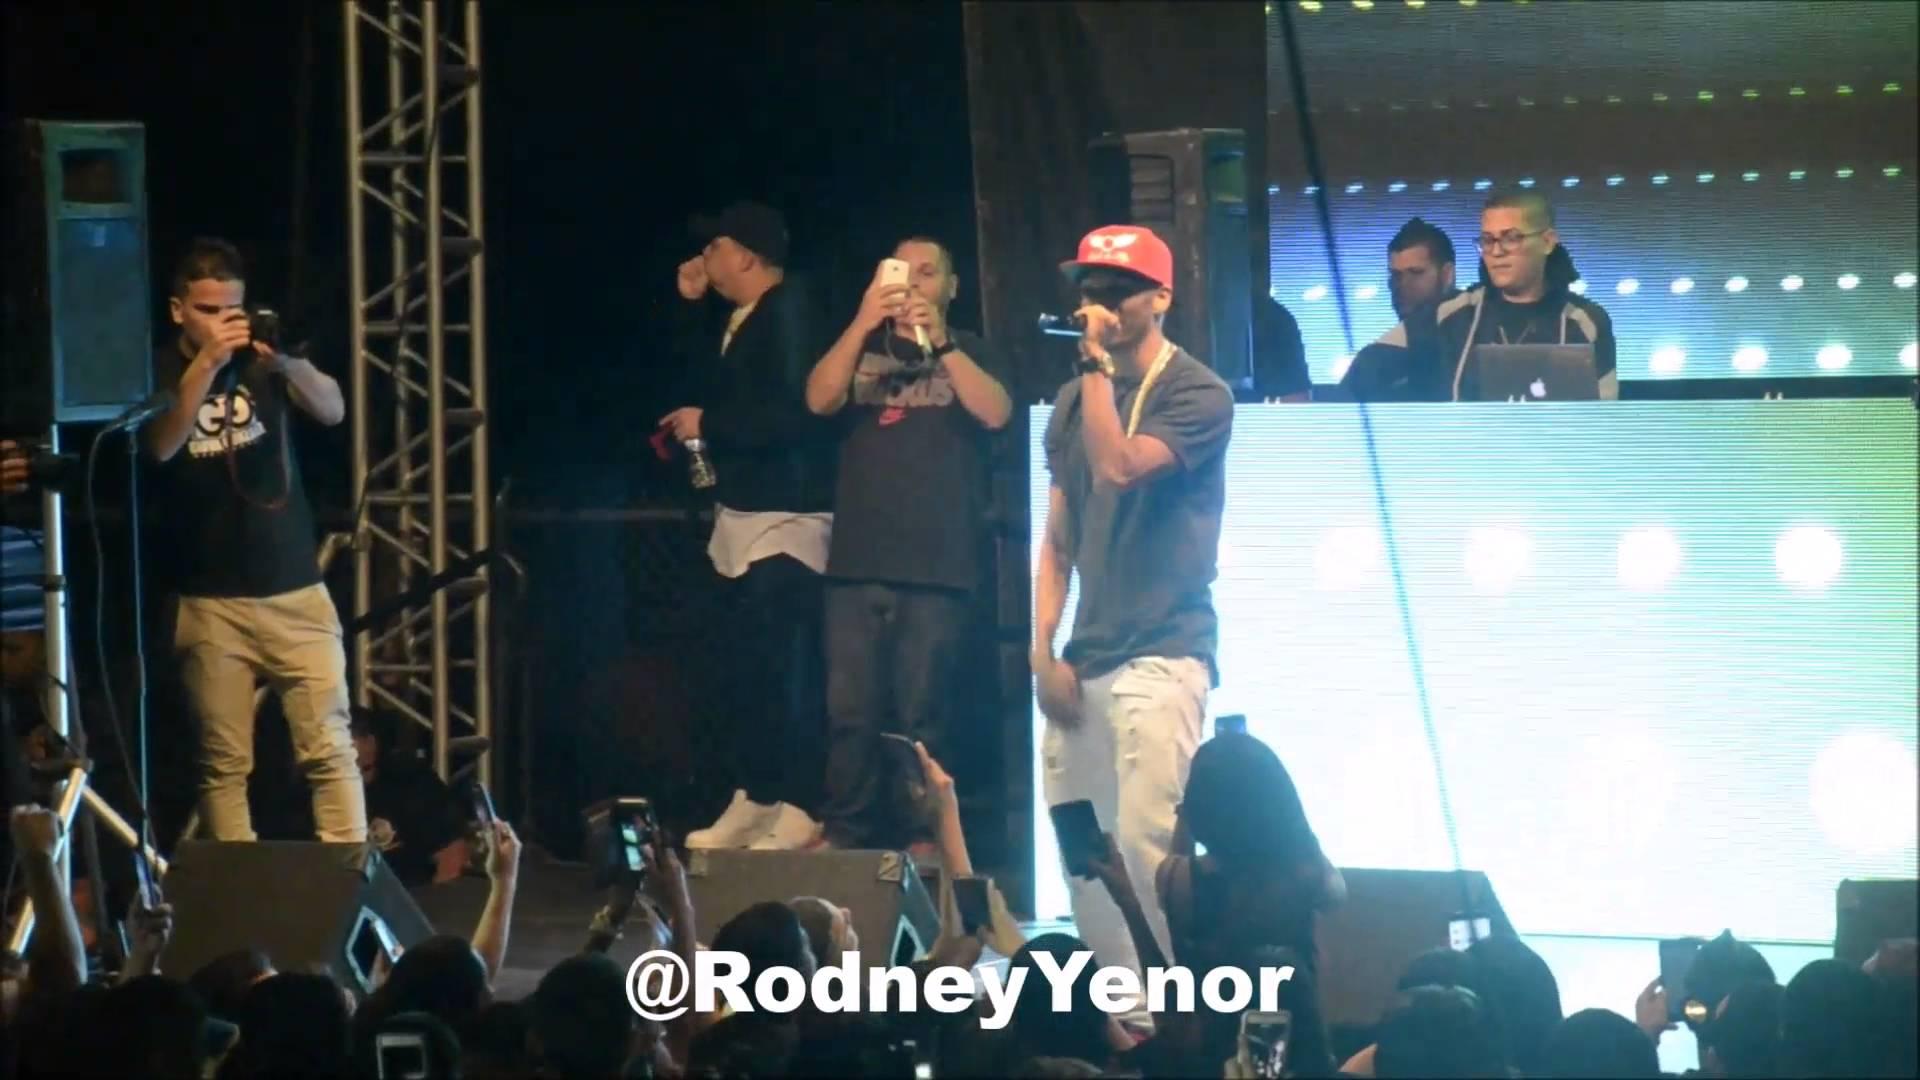 Anonimus – La Noche Me Llama (Party De Jimenez, Puerto Rico) (Live 2016)